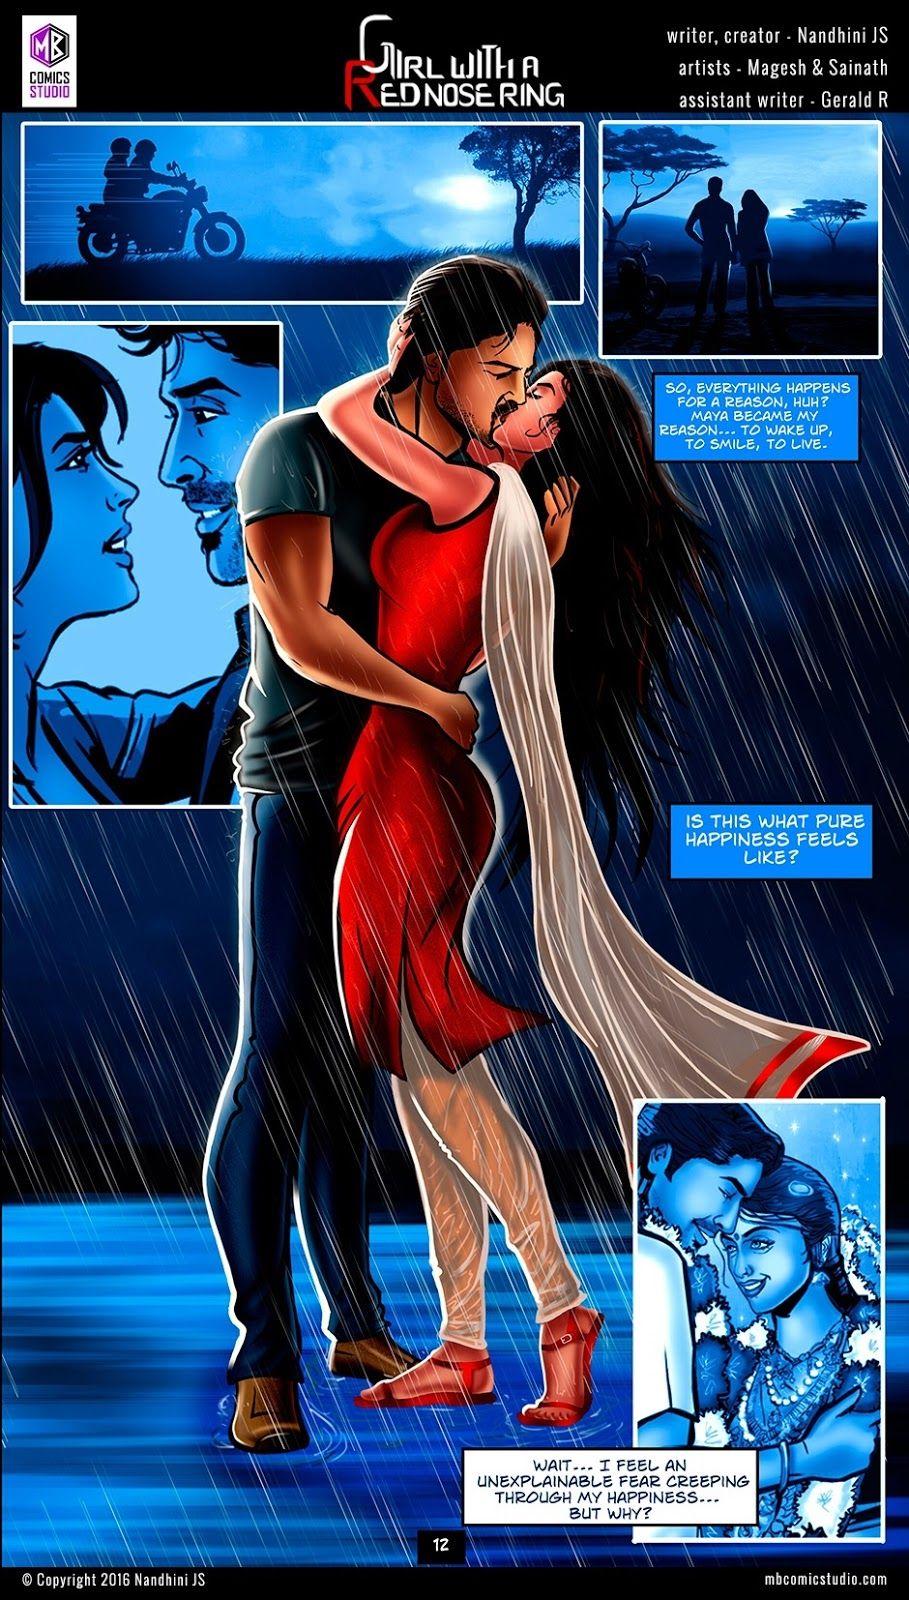 Page 11 & 12 Download comics, Online comic books, Comics pdf